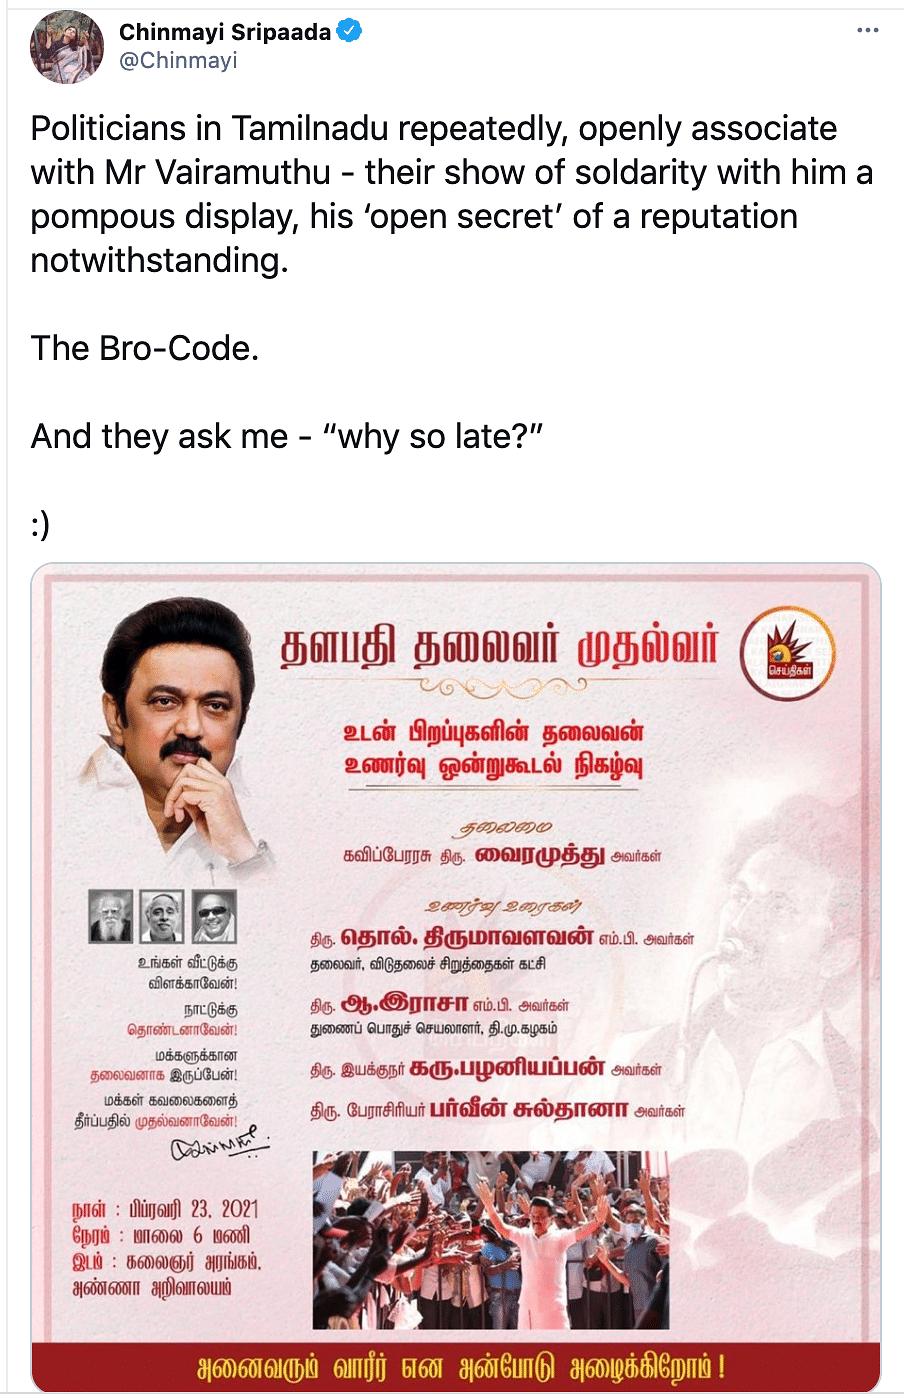 DMK Criticised for Inviting #MeToo Accused Vairamuthu to Event